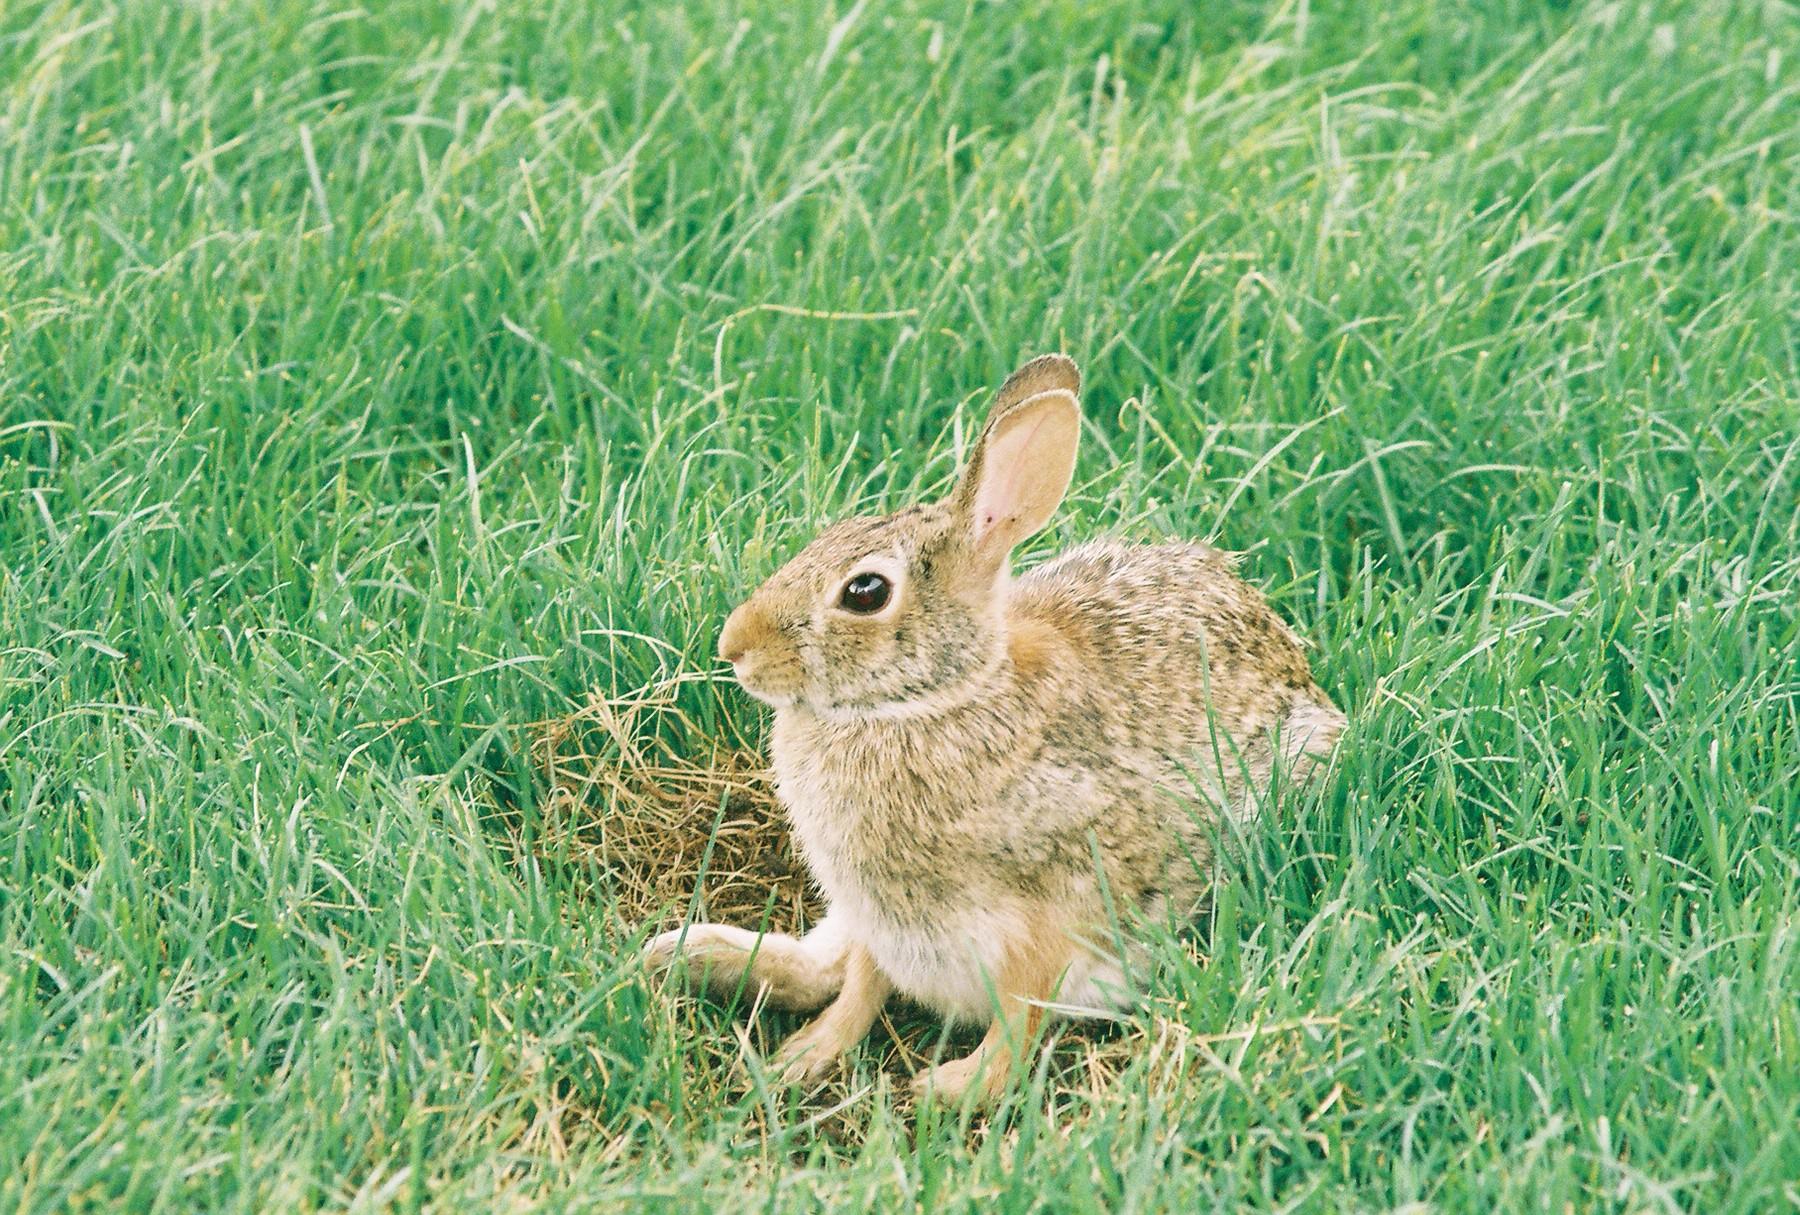 Cottontail rabbit habitat - photo#19